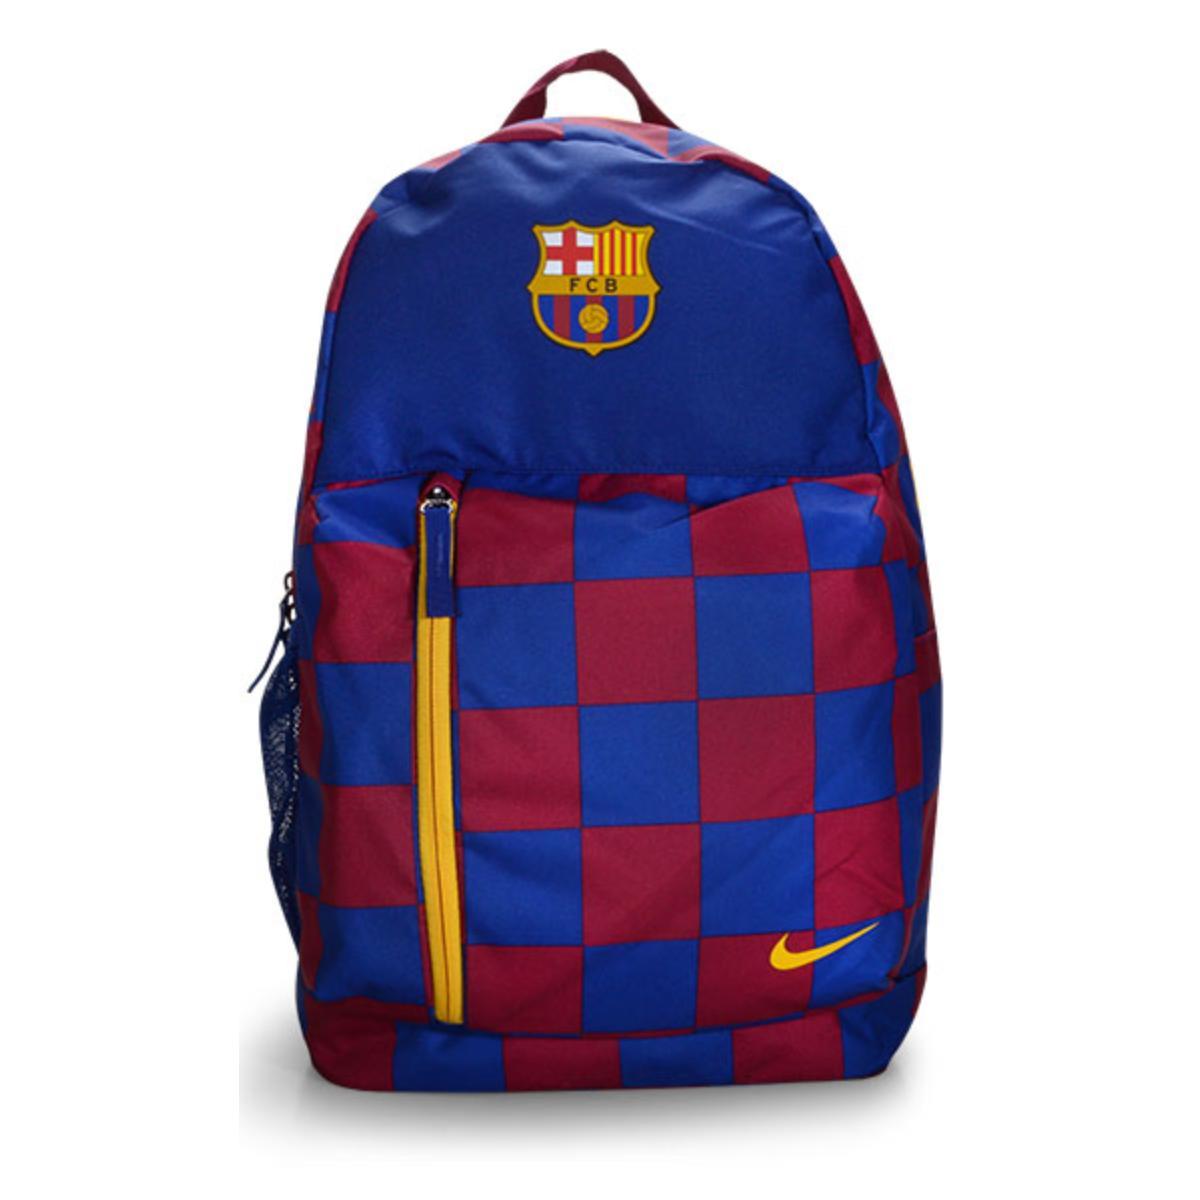 Mochila Unisex Nike Ba5524-457 fc Barcelona Stadium Azul/vermelho